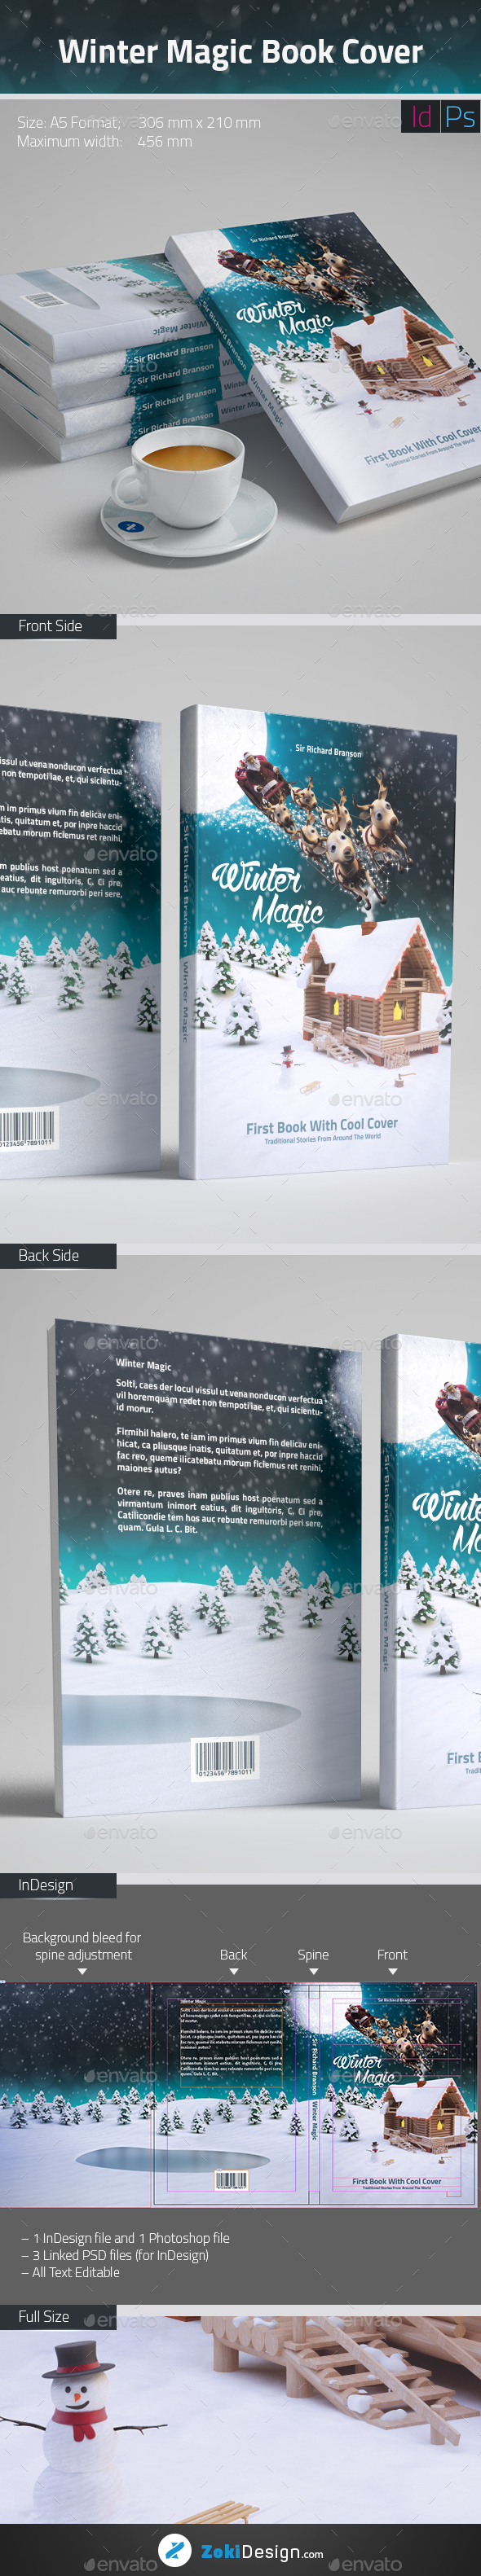 Winter Magic Book Cover Template - Miscellaneous Print Templates